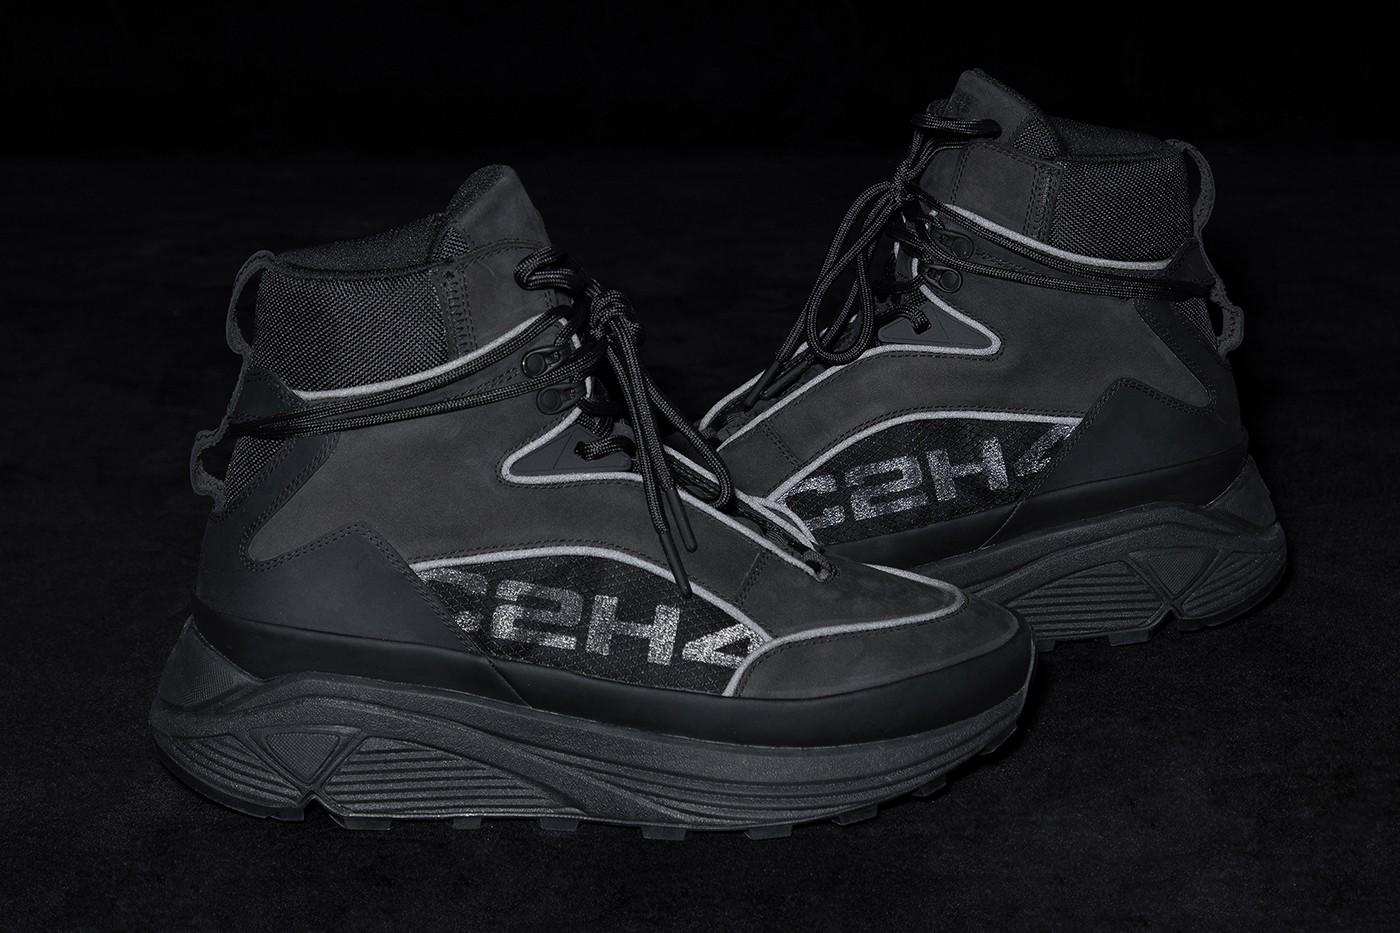 https___hypebeast.com_image_2020_11_c2h4-footwear-atom-alpha-quark-alpha-release-info-006